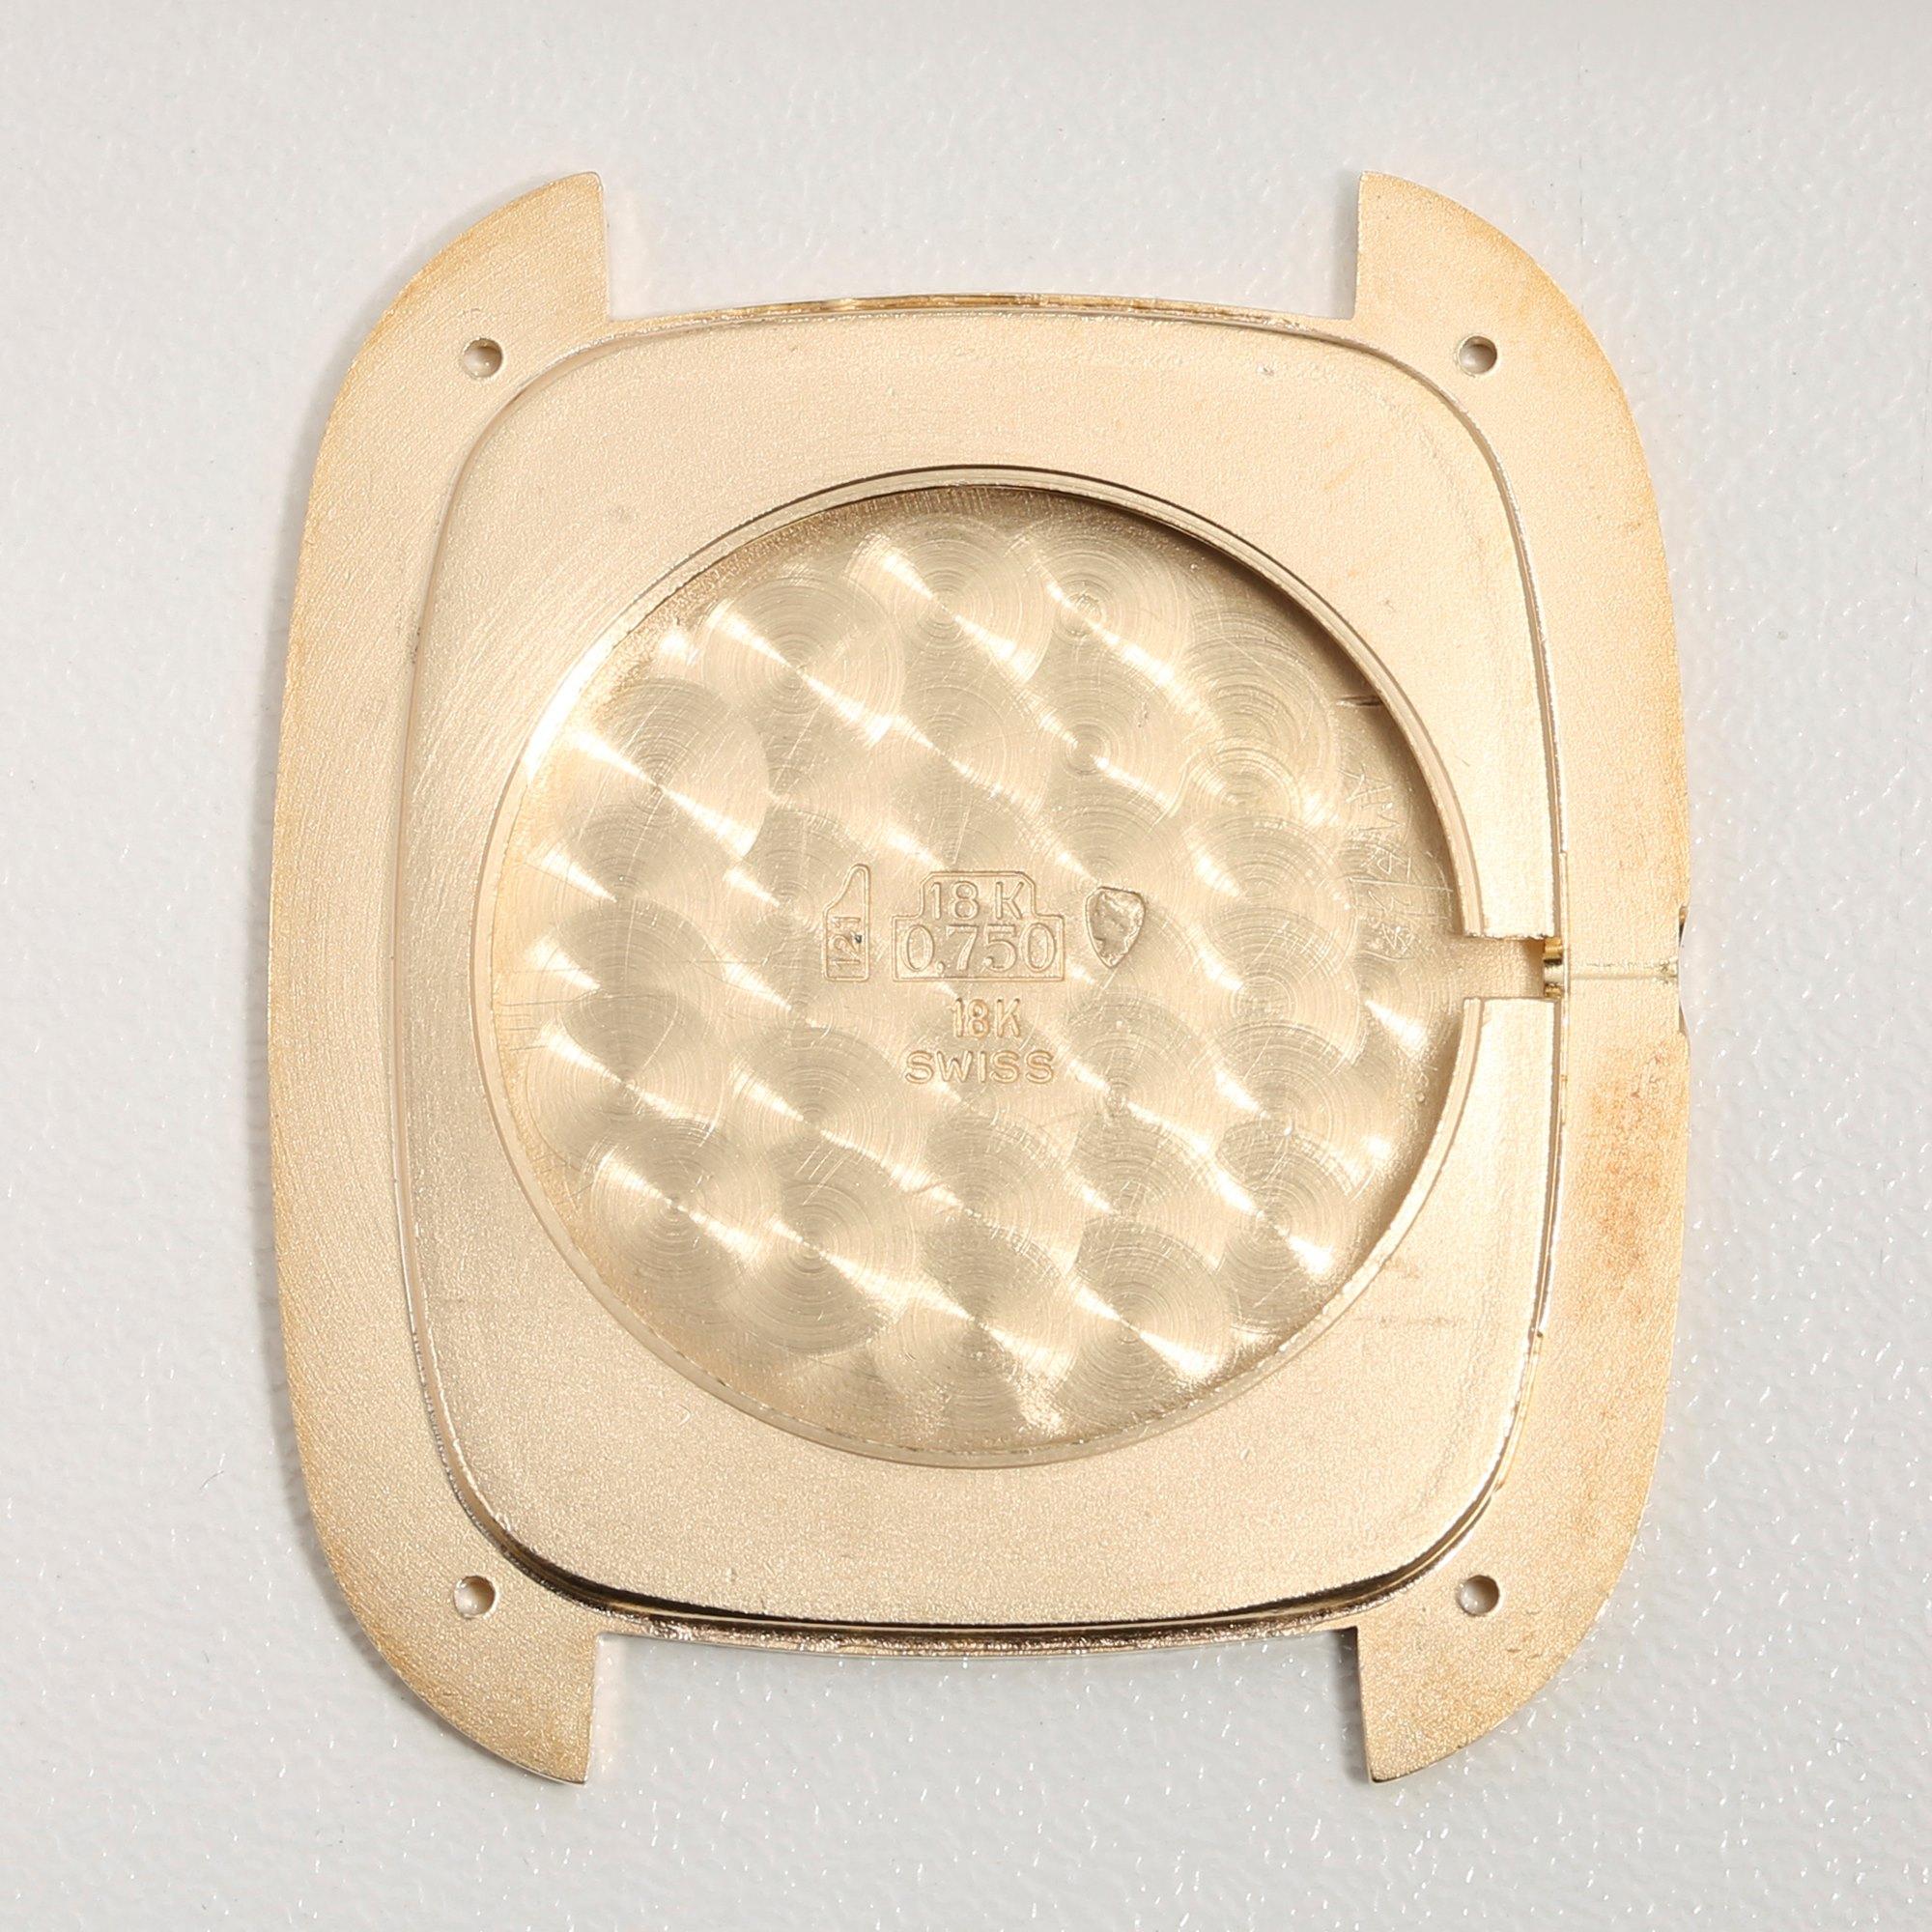 Cartier Gondole Jumbo Paris 18K Yellow Gold - 81720400 Yellow Gold 81720400